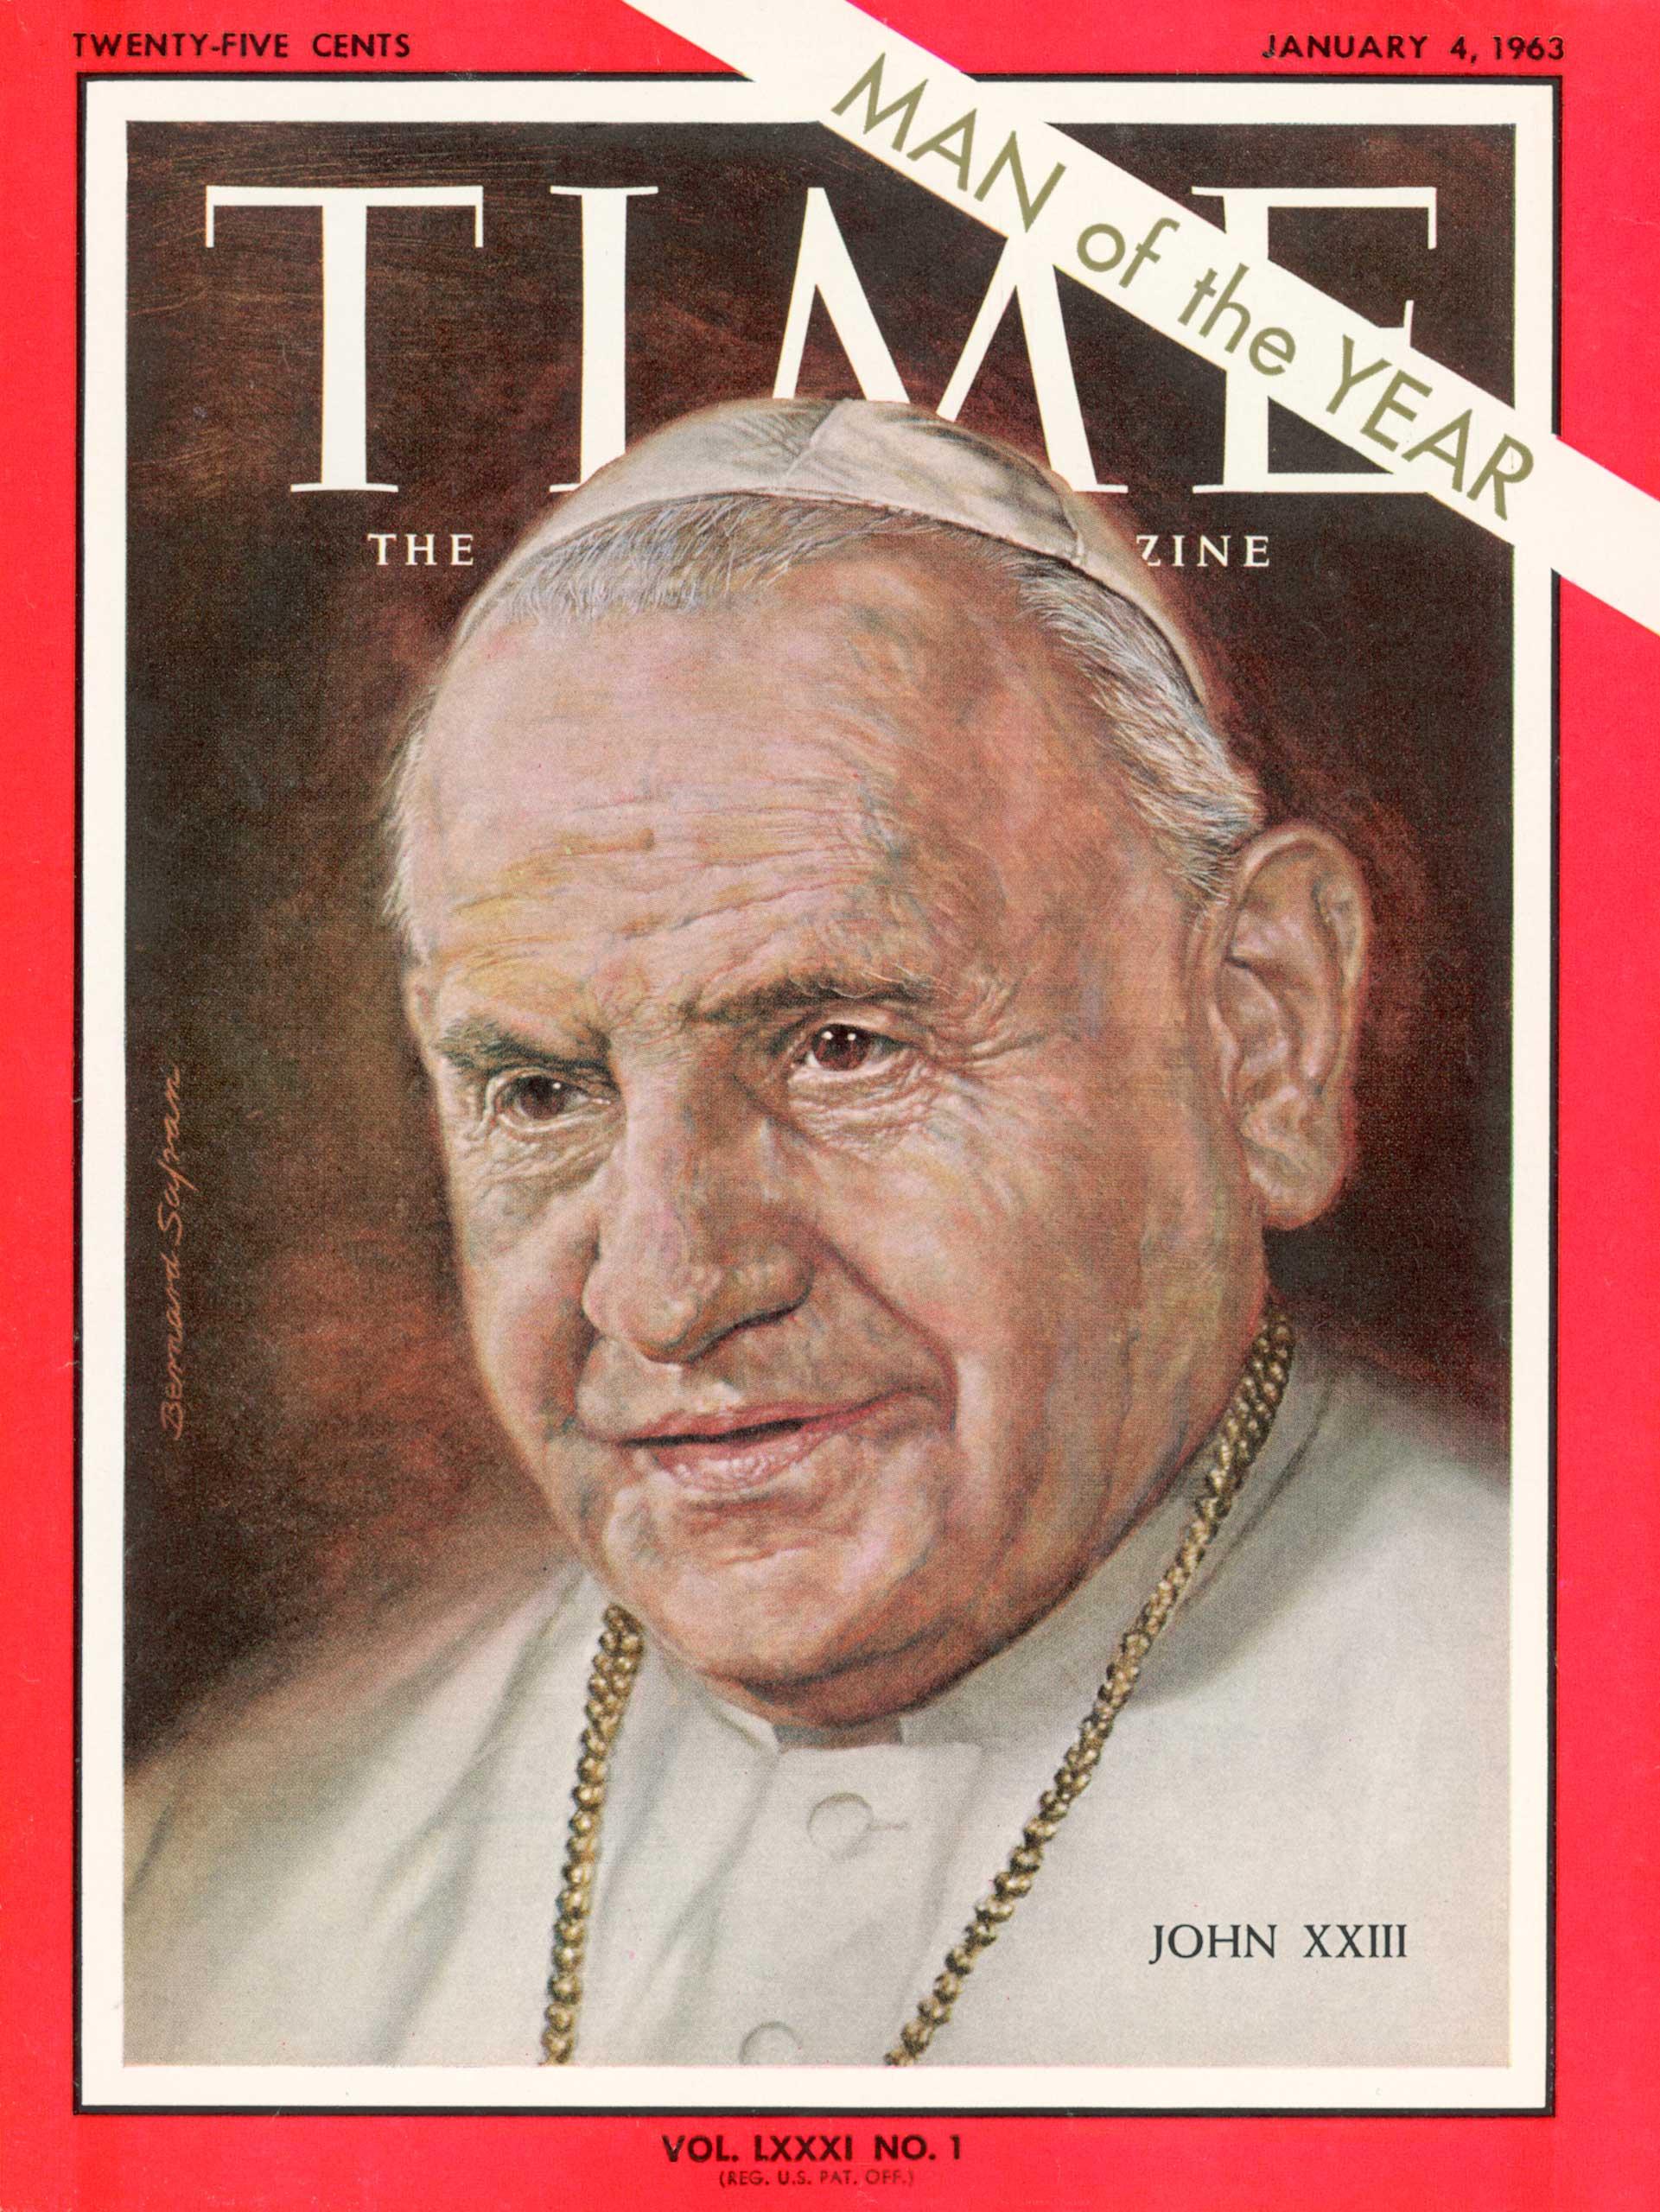 1962: Pope John XXIII